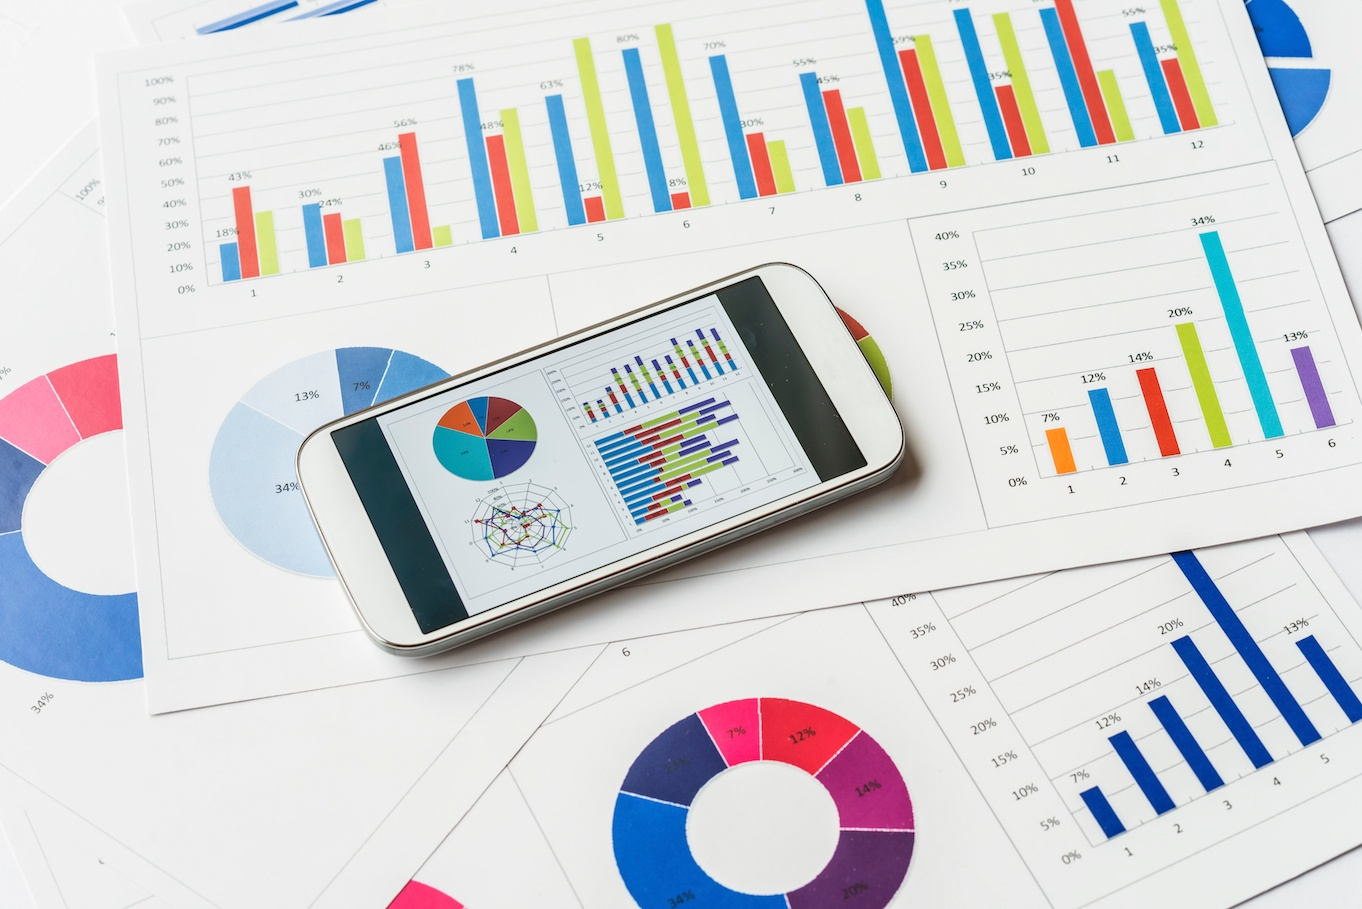 Data Integration and Utilization